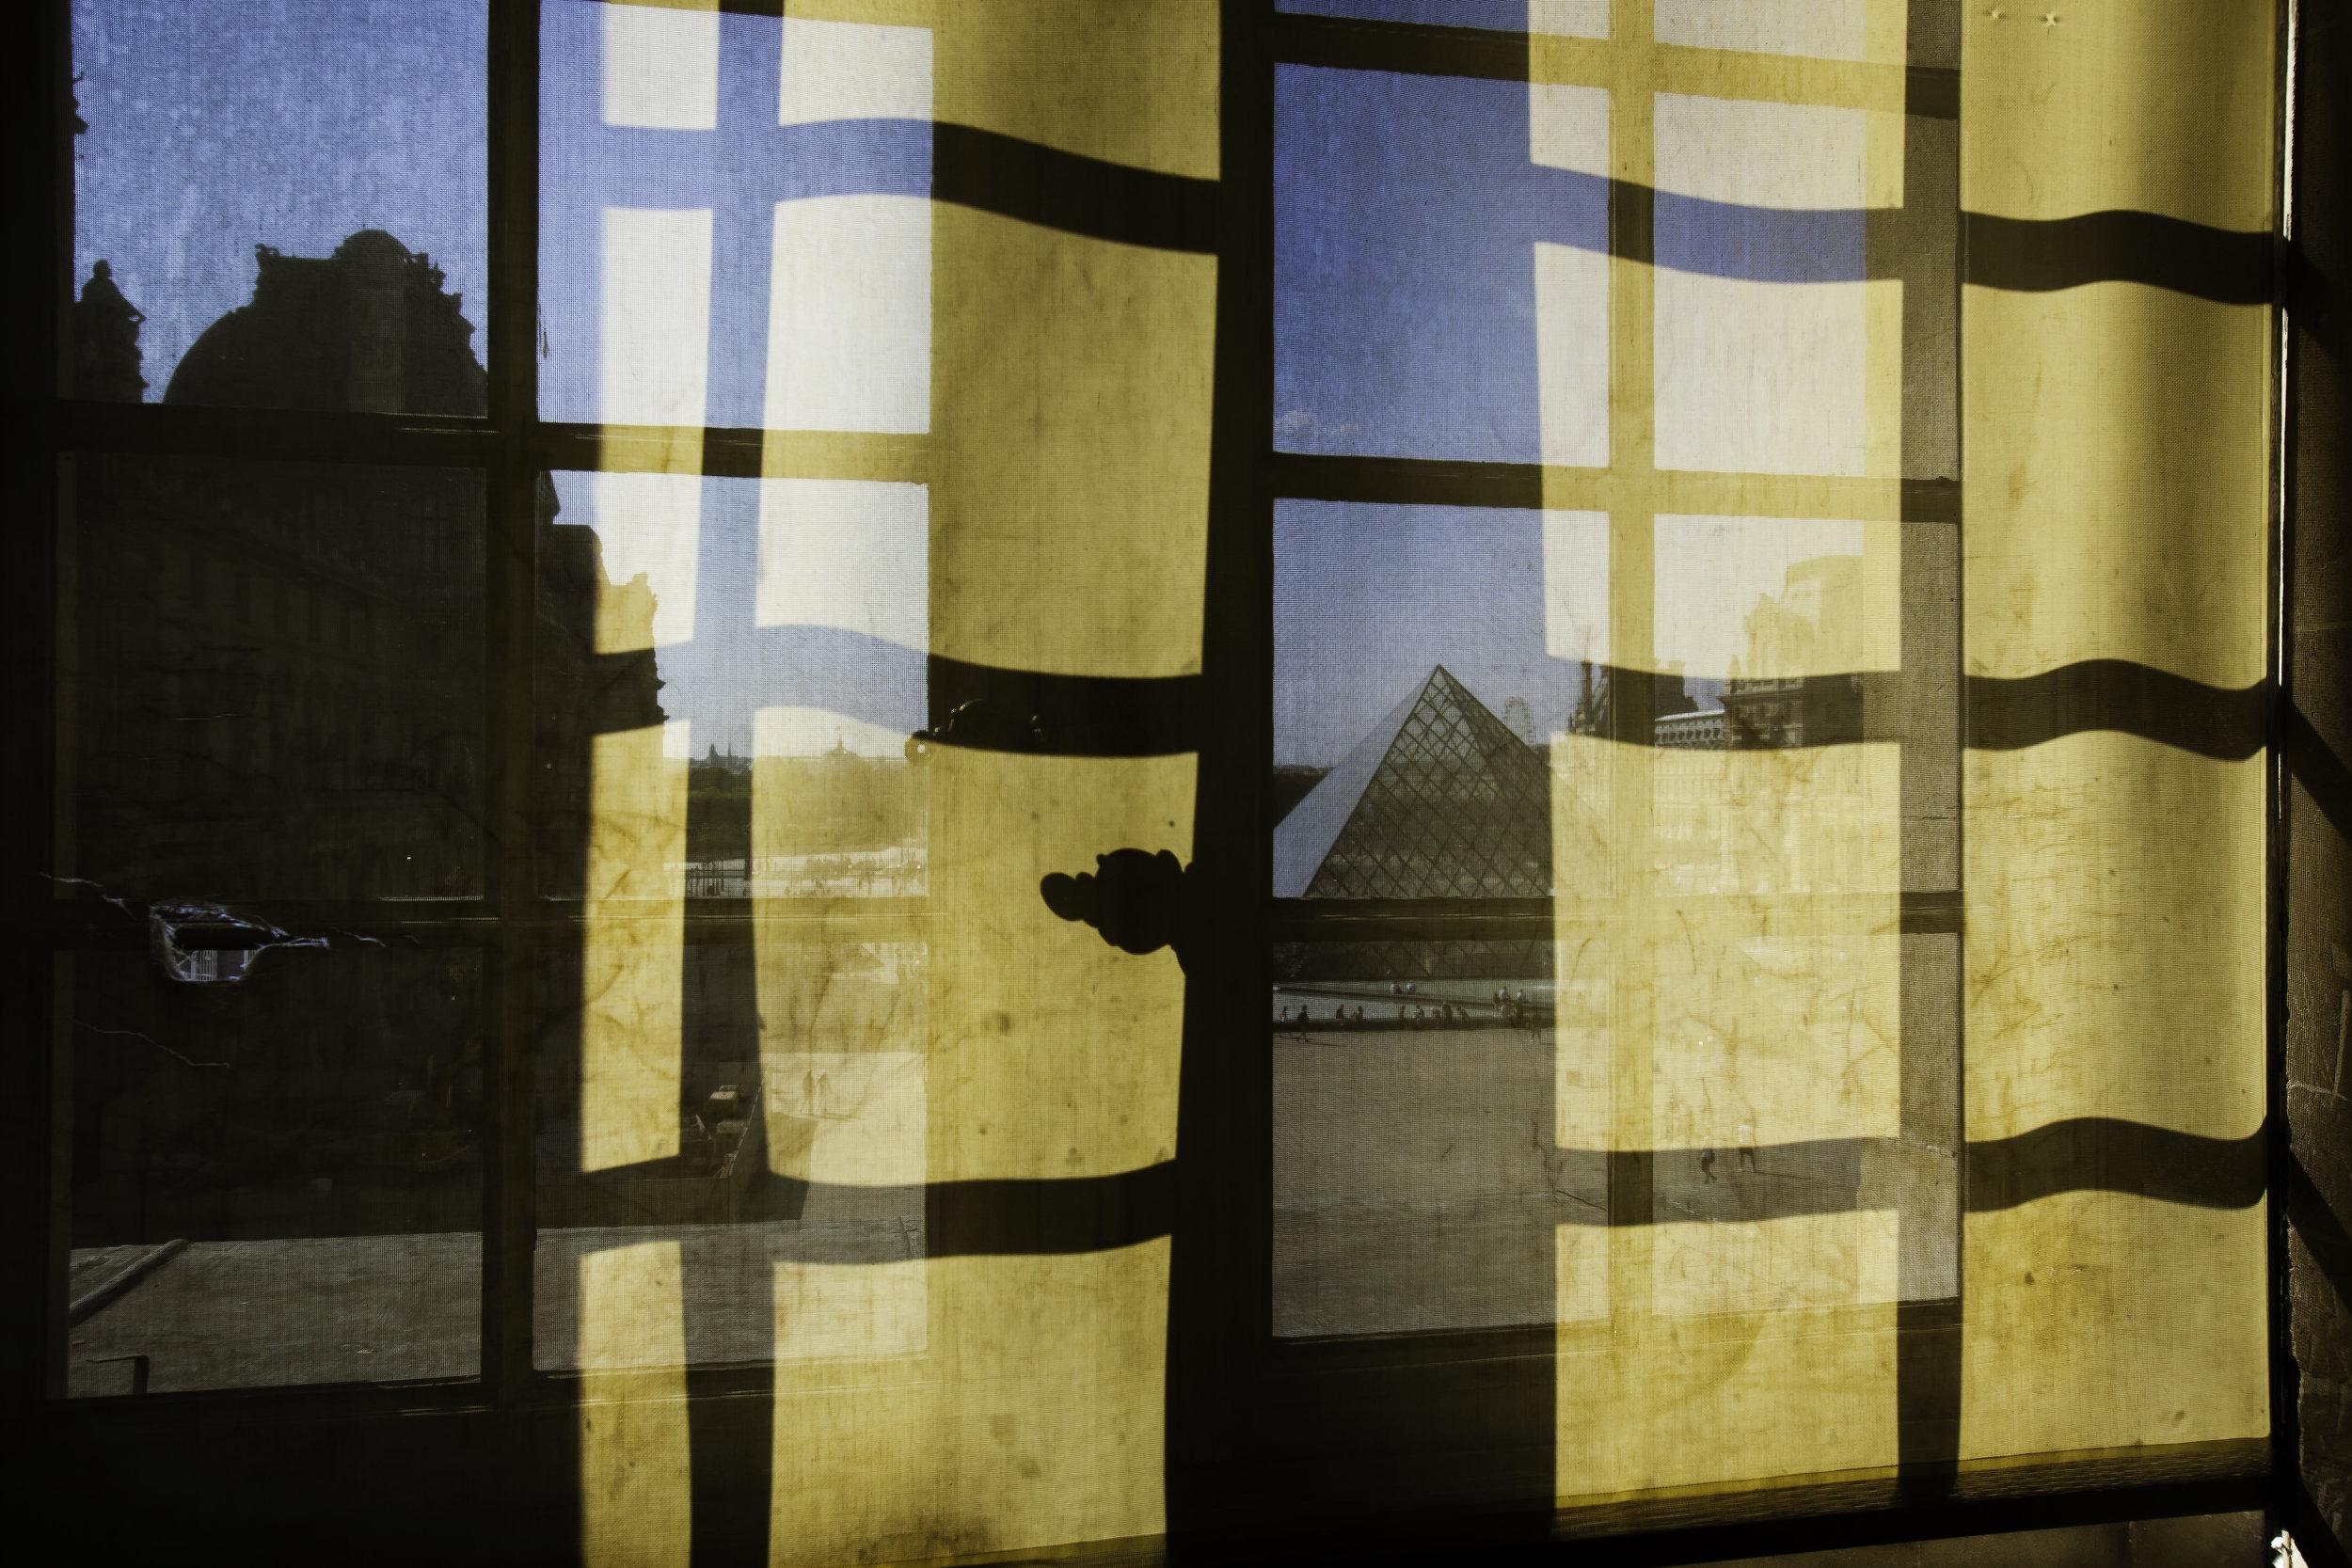 20090813_PARIS 1240.jpg